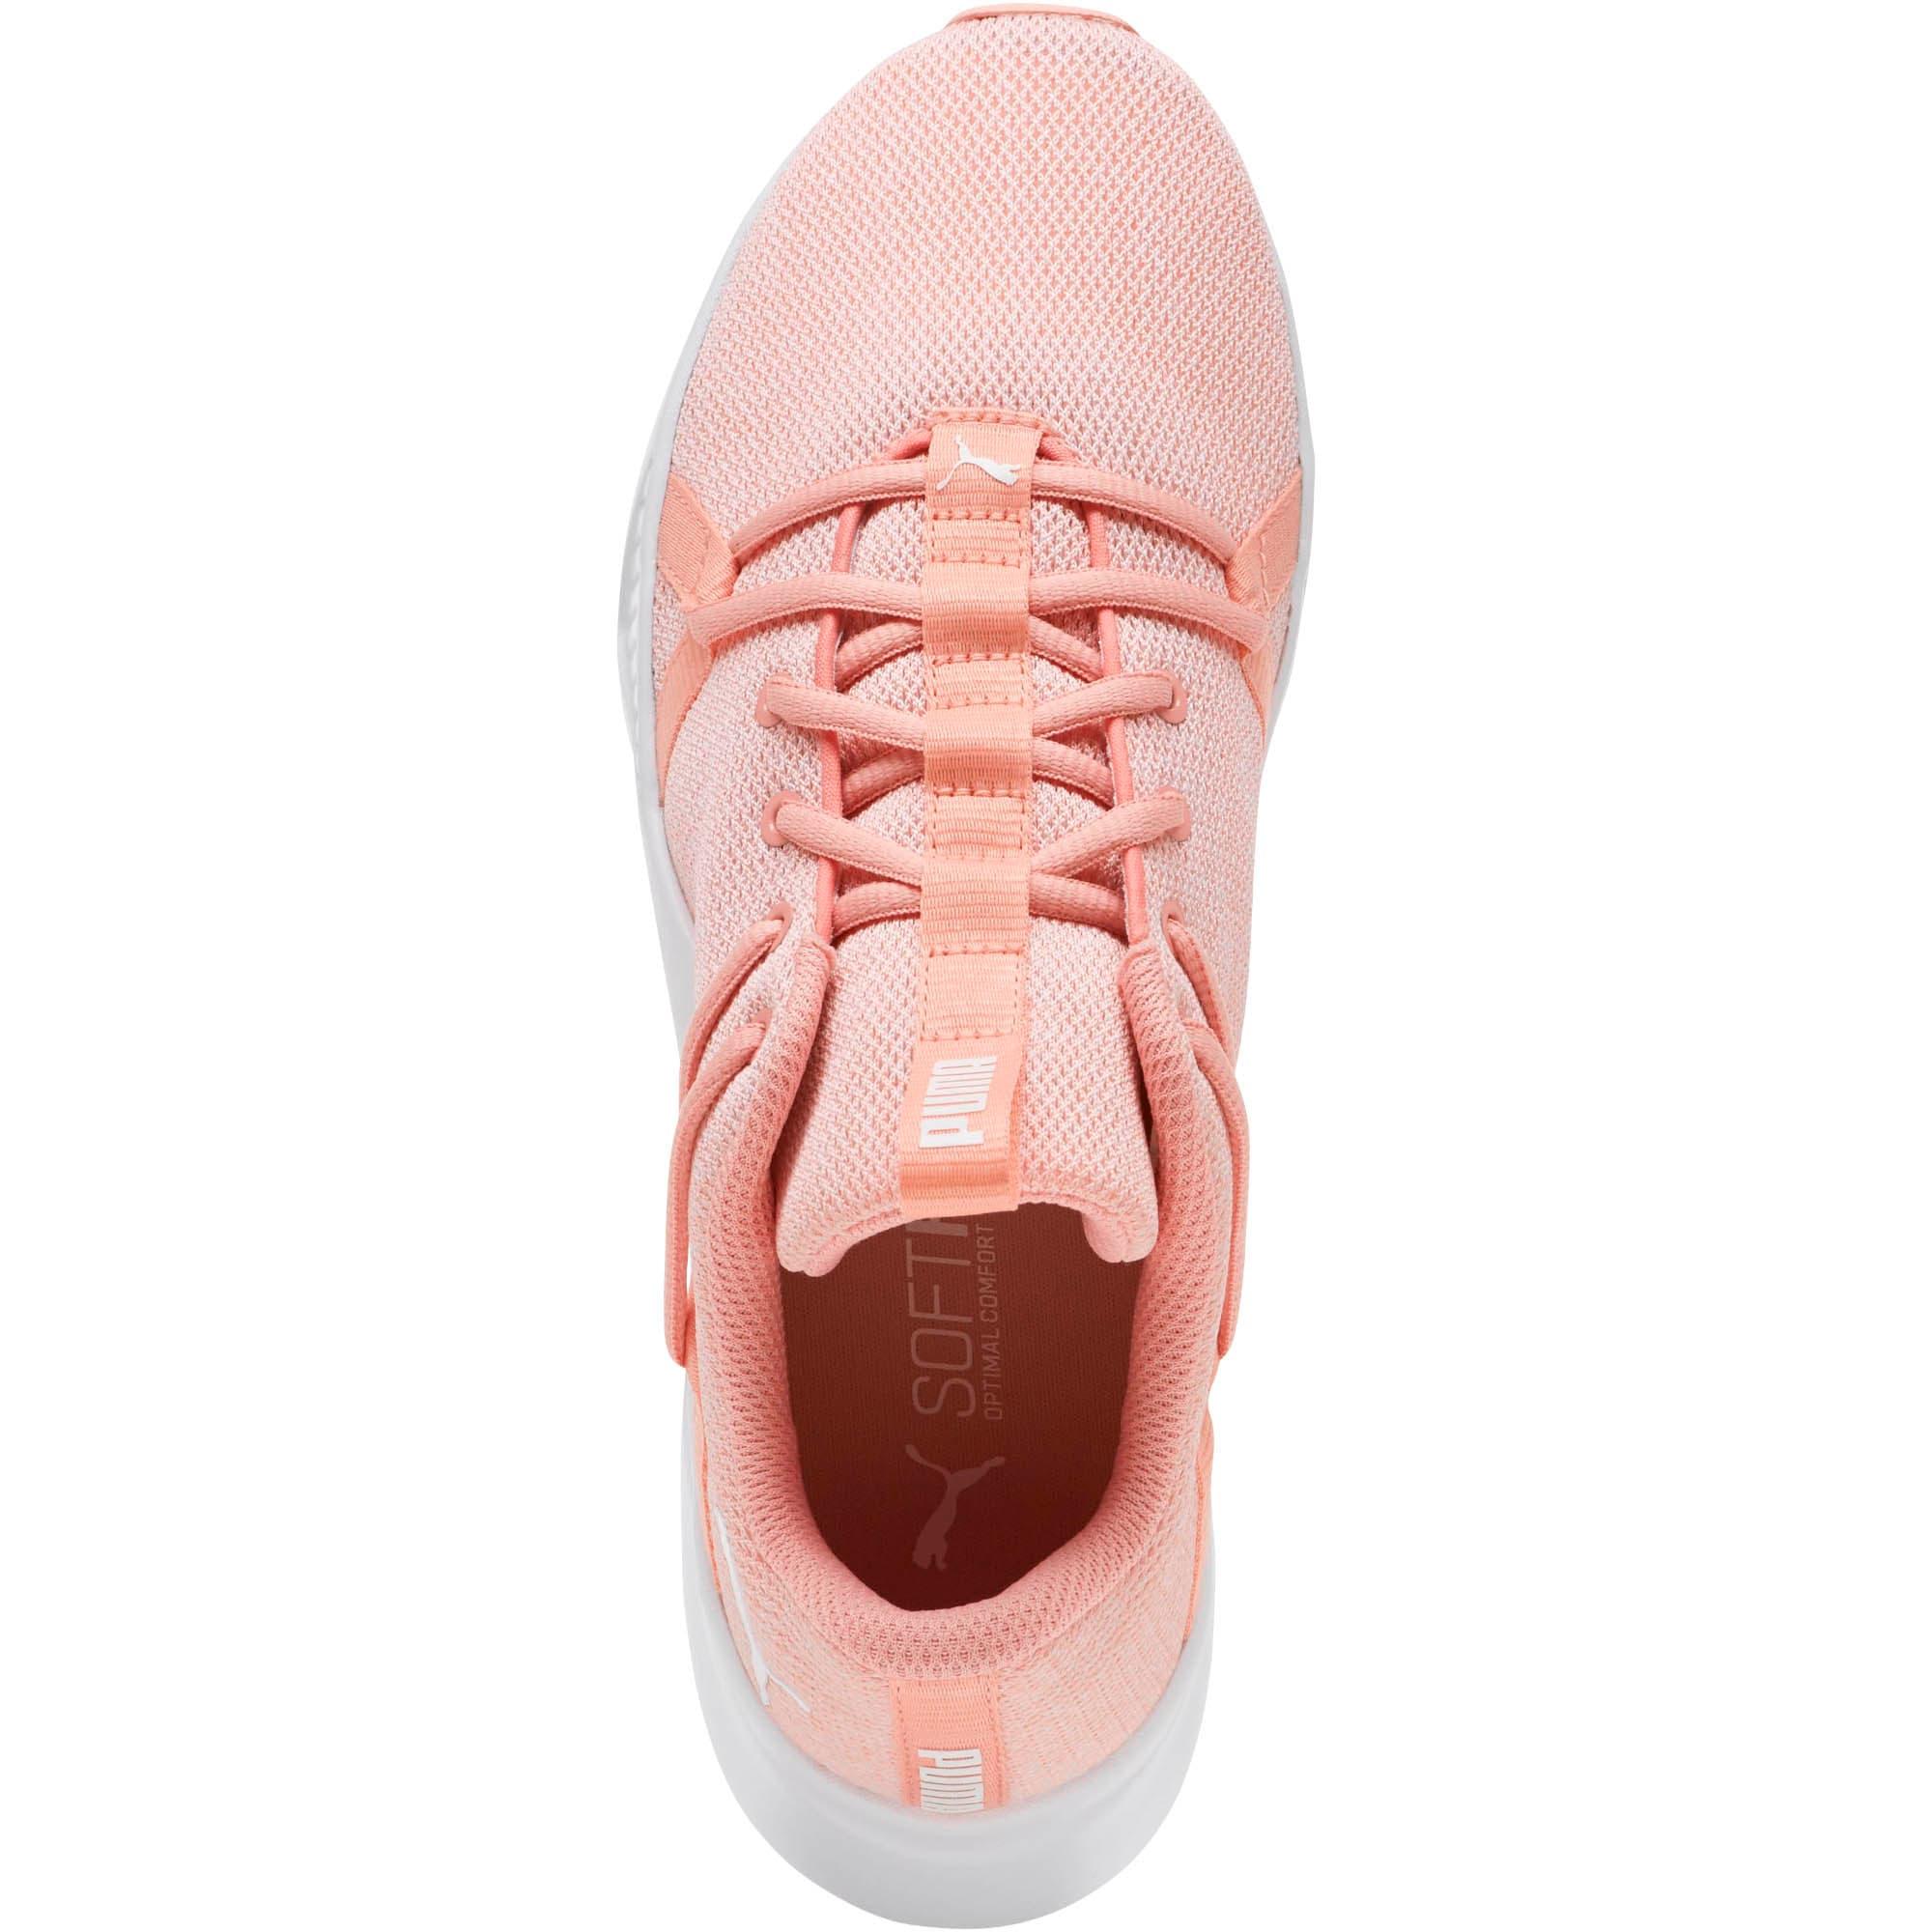 Thumbnail 5 of Incite Knit Women's Training Shoes, Peach Bud-Puma White, medium